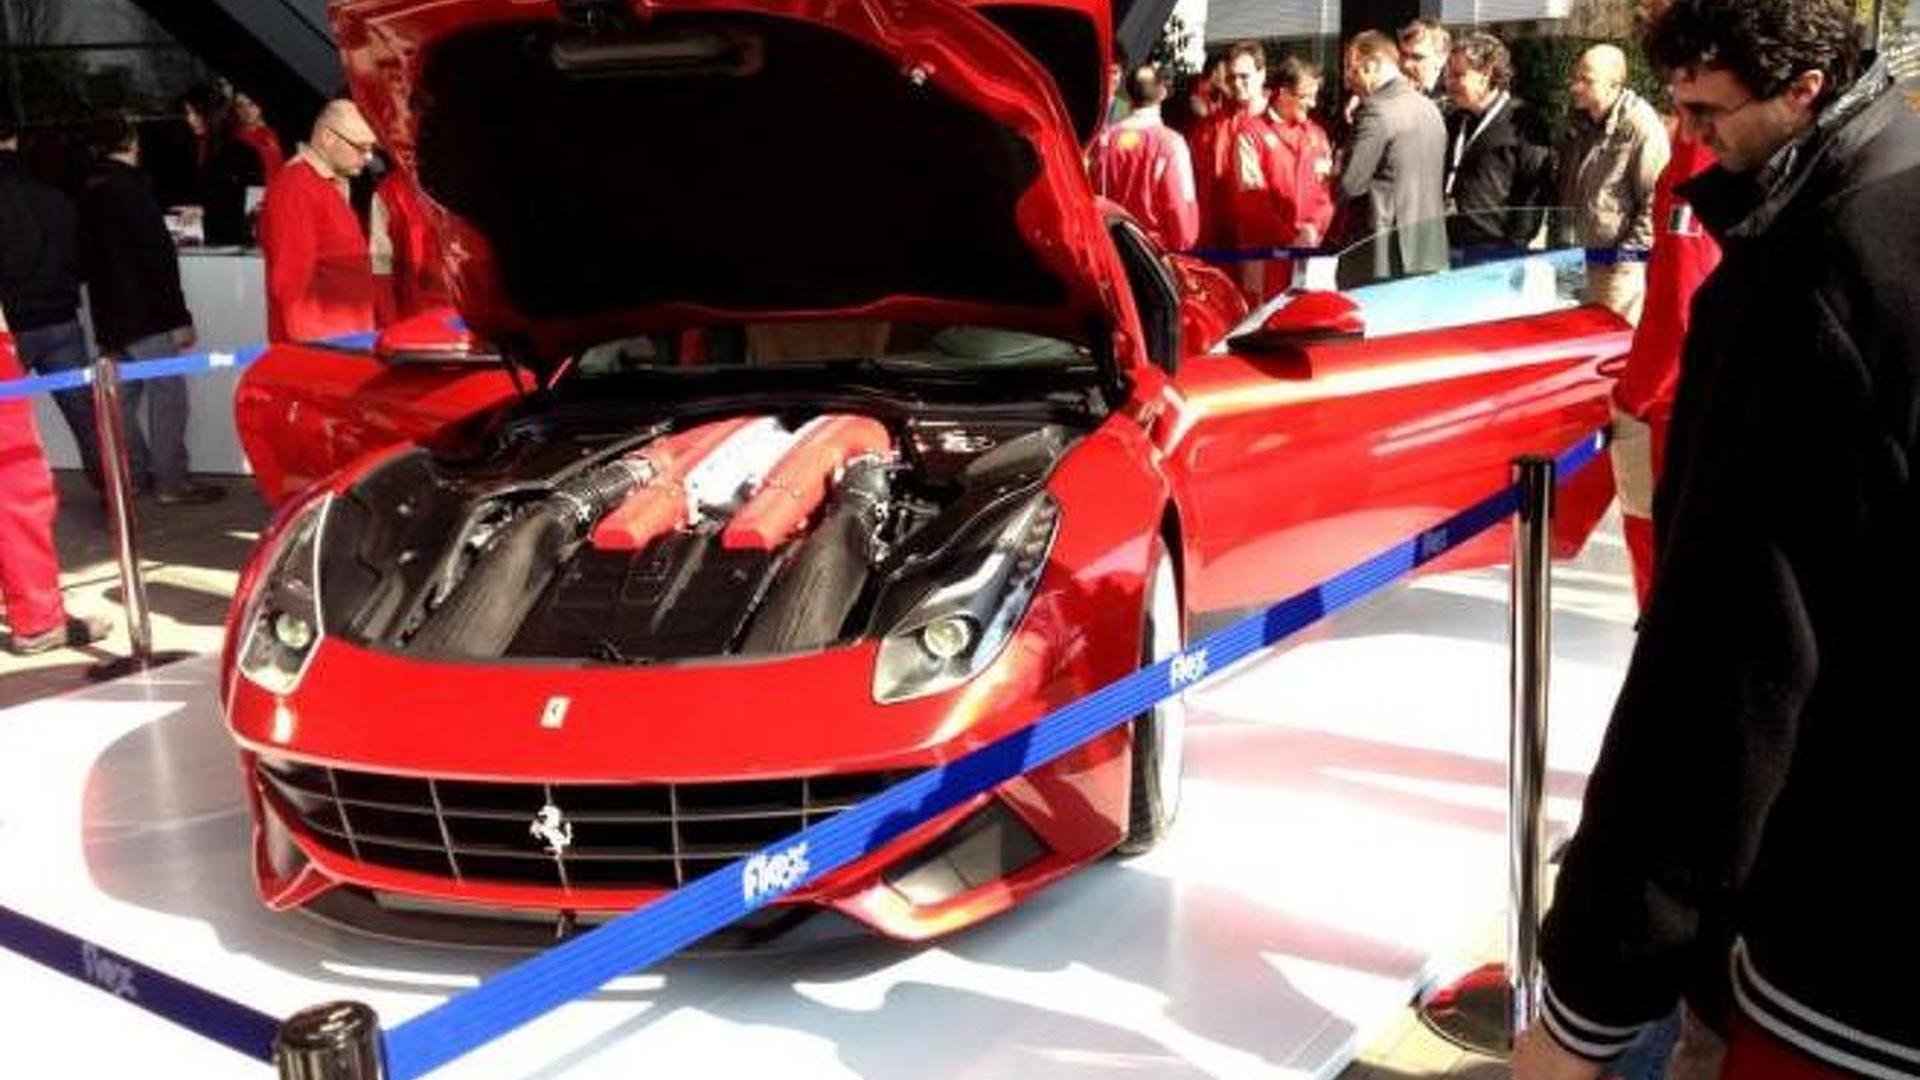 Ferrari F12 Berlinetta first live images